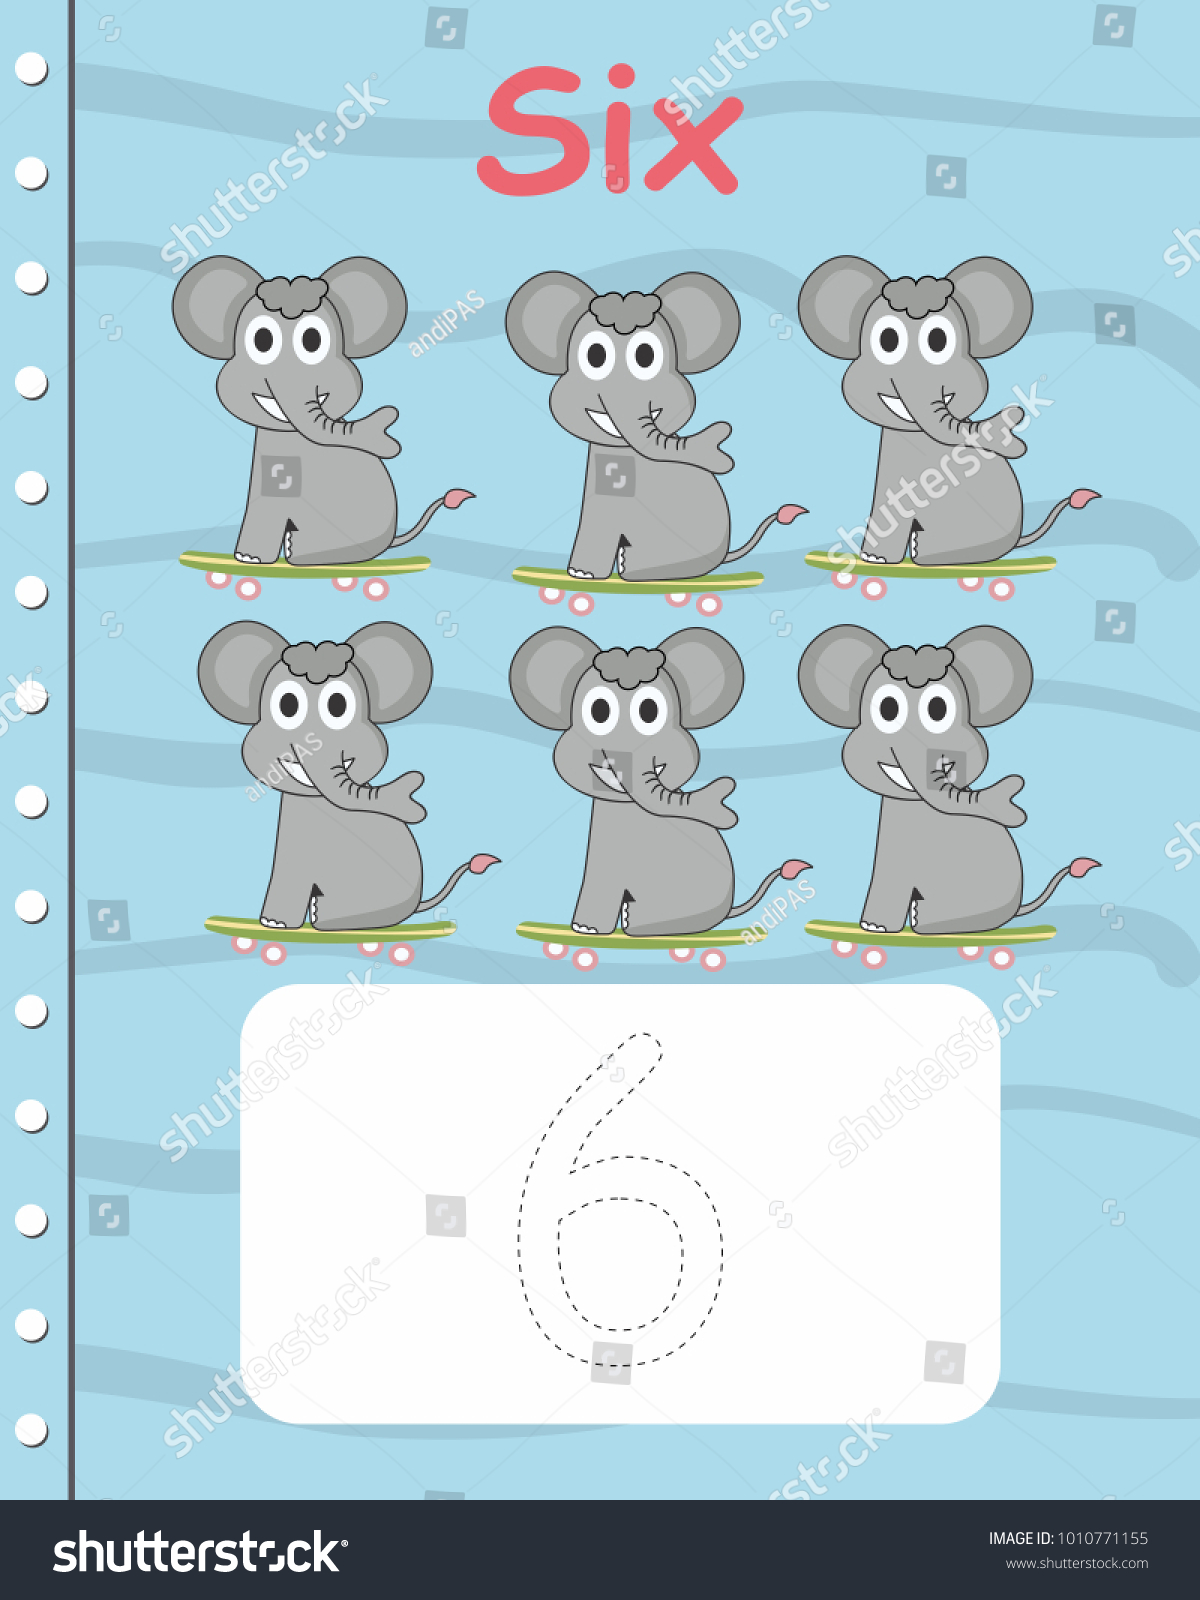 Printable Worksheet Kindergarten Preschool We Train Stock Photo ...